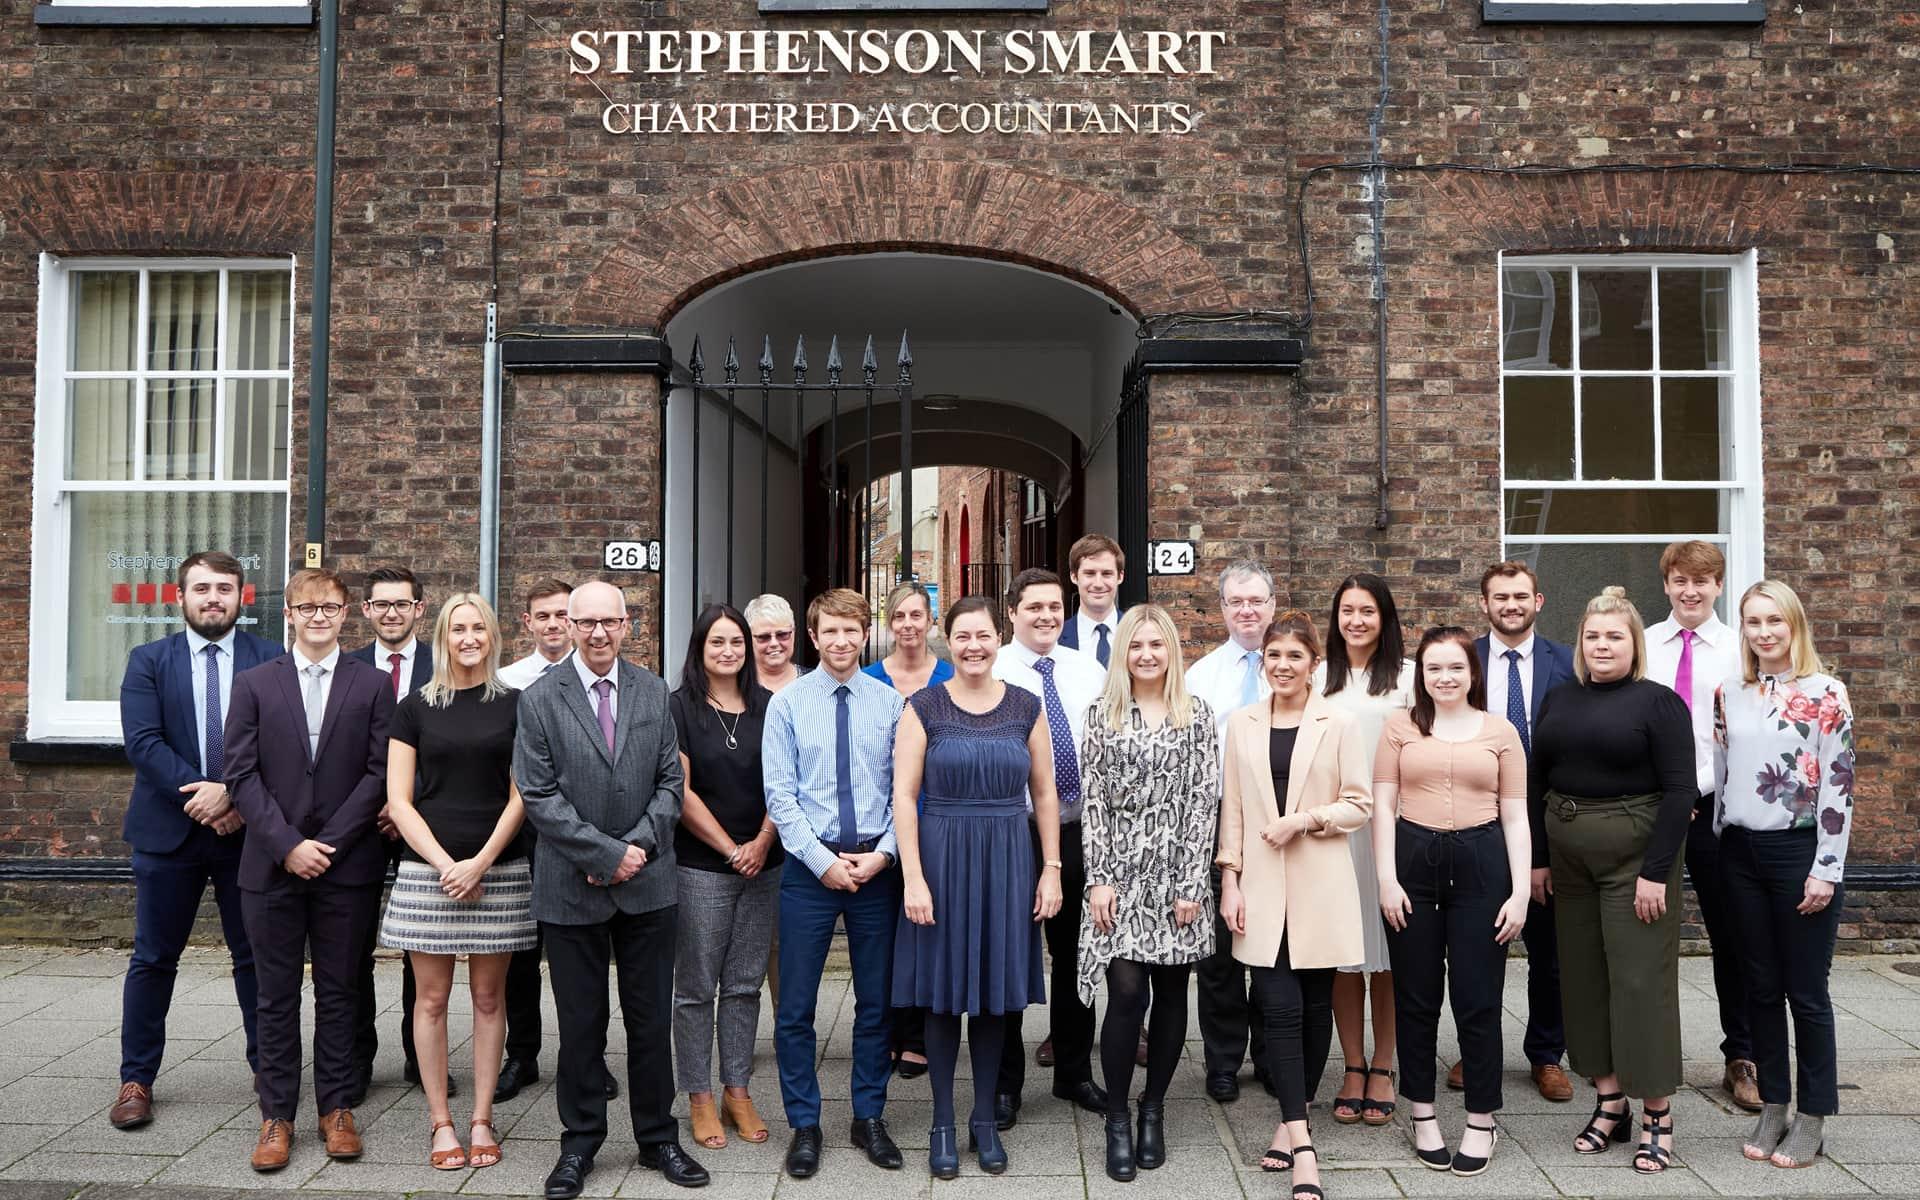 Stephenson Smart: King's Lynn